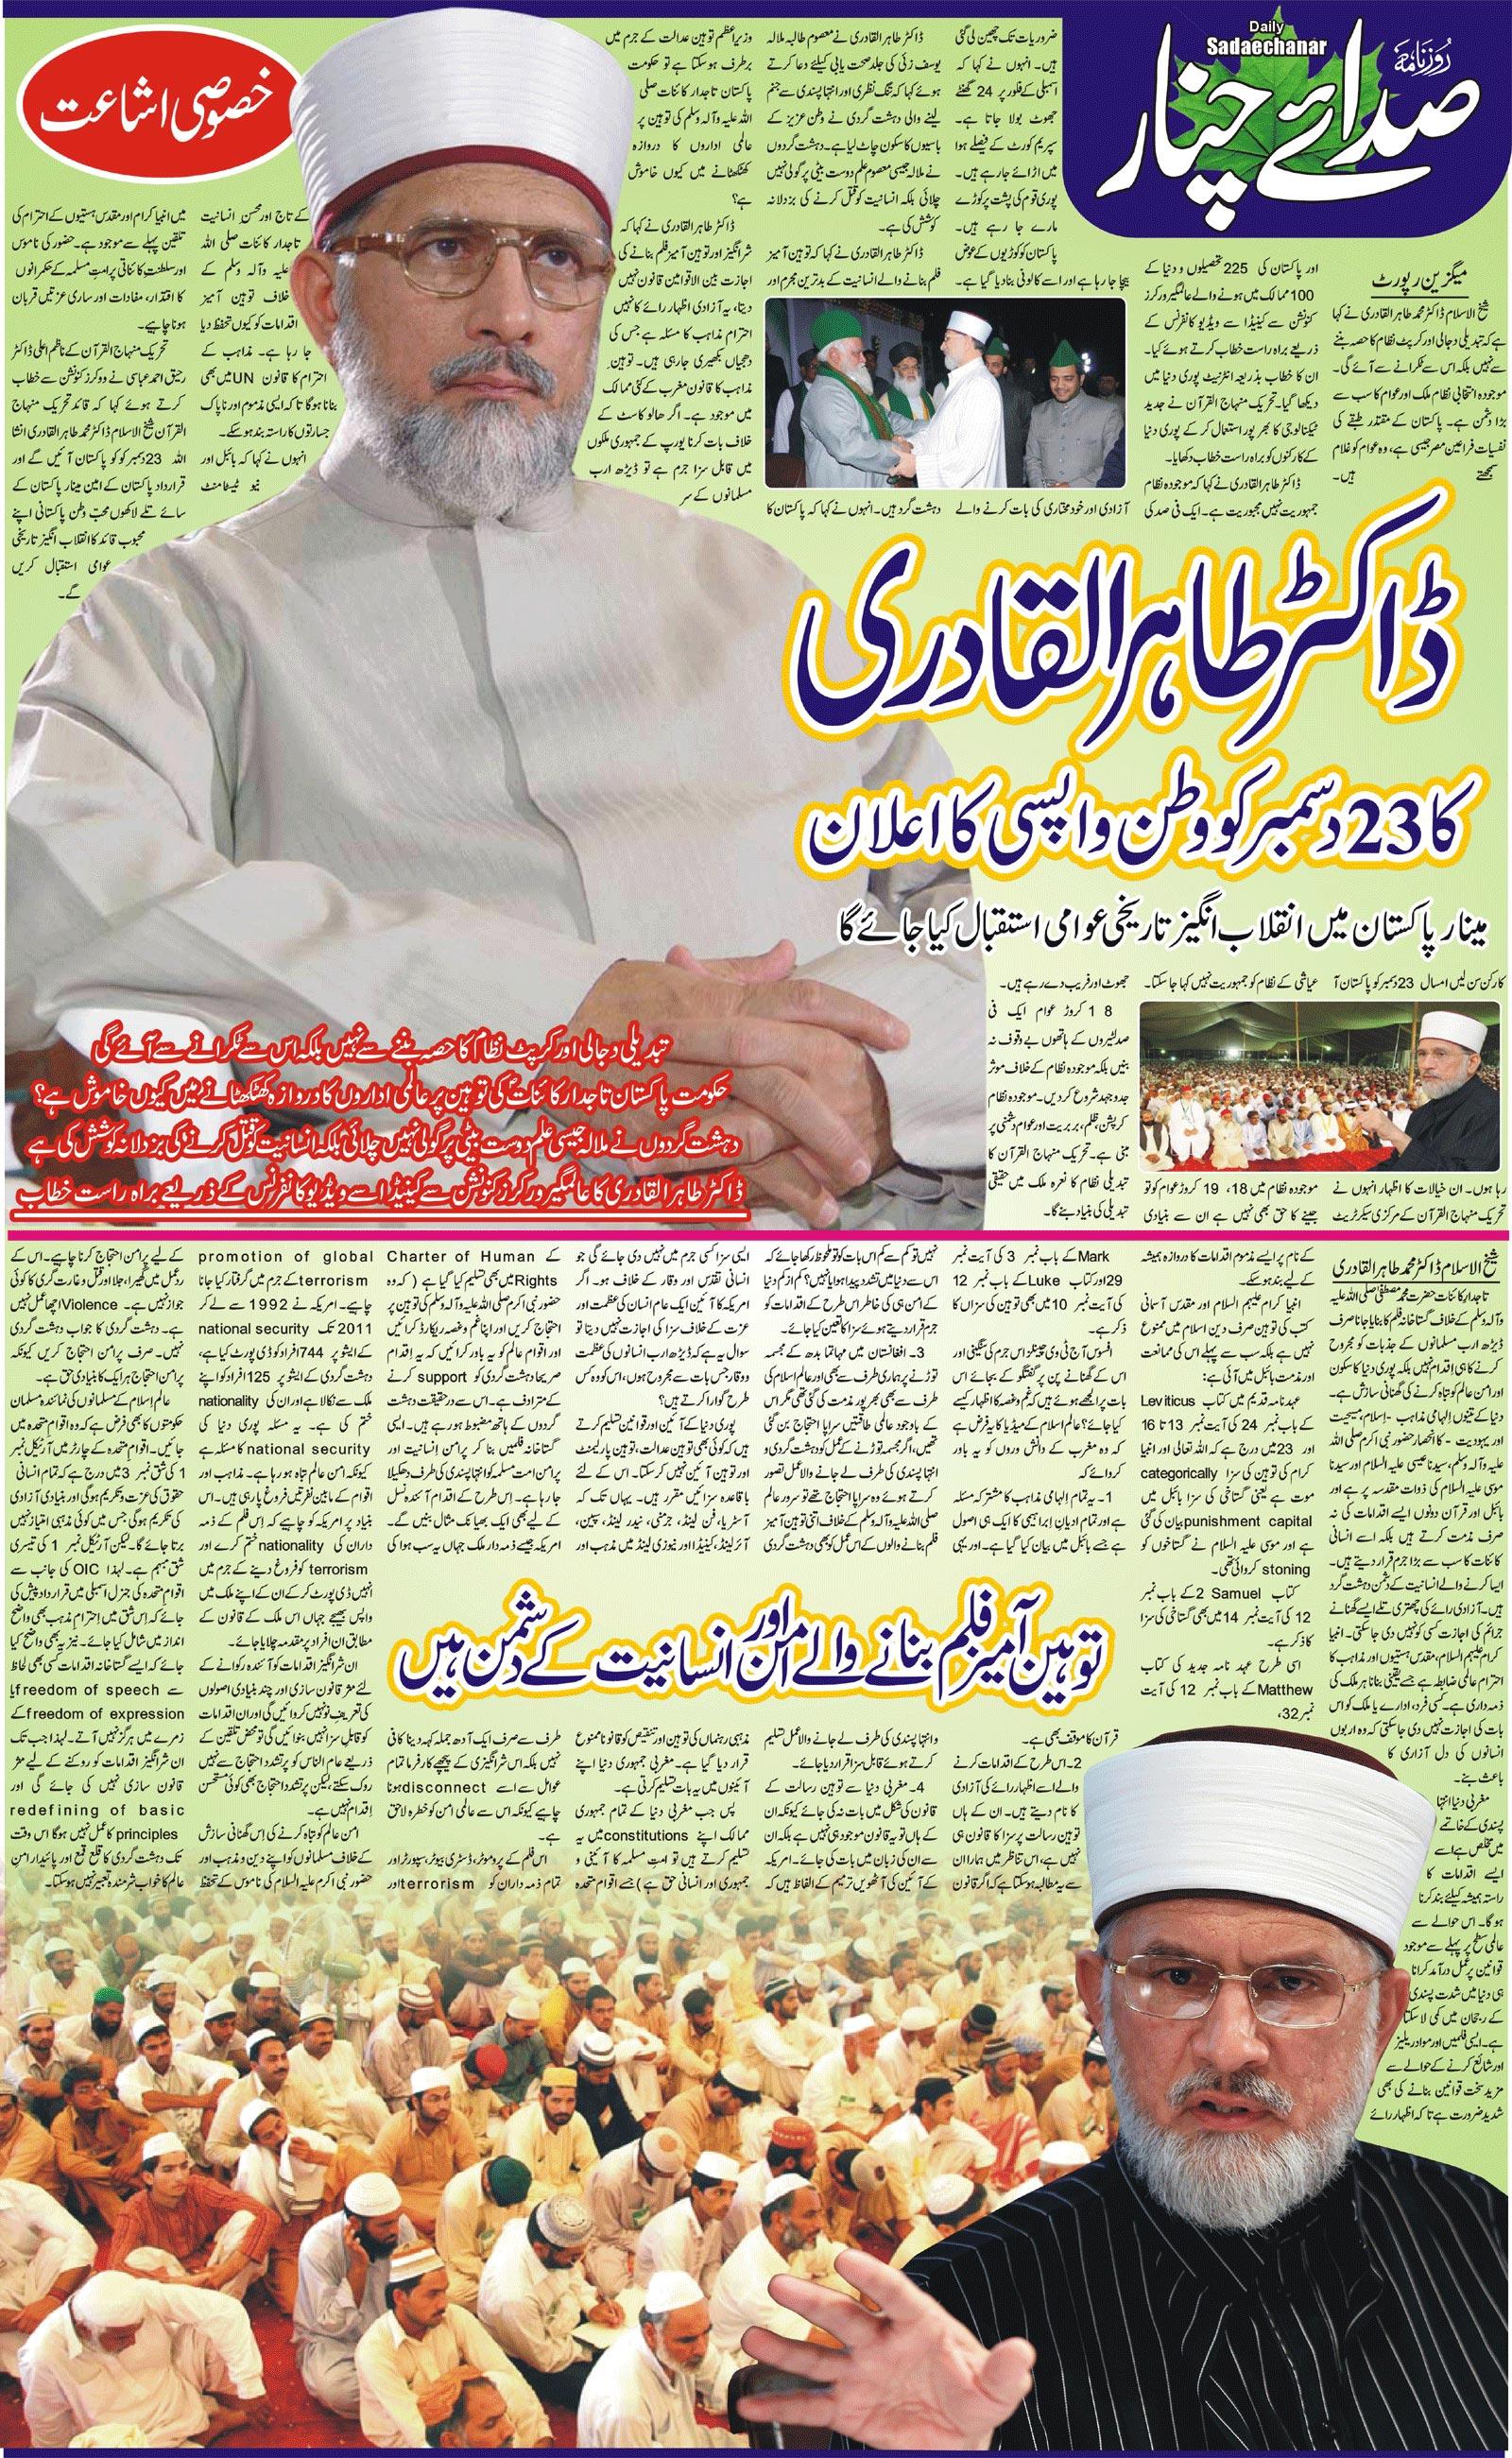 Mustafavi Student Movement Print Media Coverage Daily Sada e Chanar (Rawalpindi/ Islamabad) - Page: 5